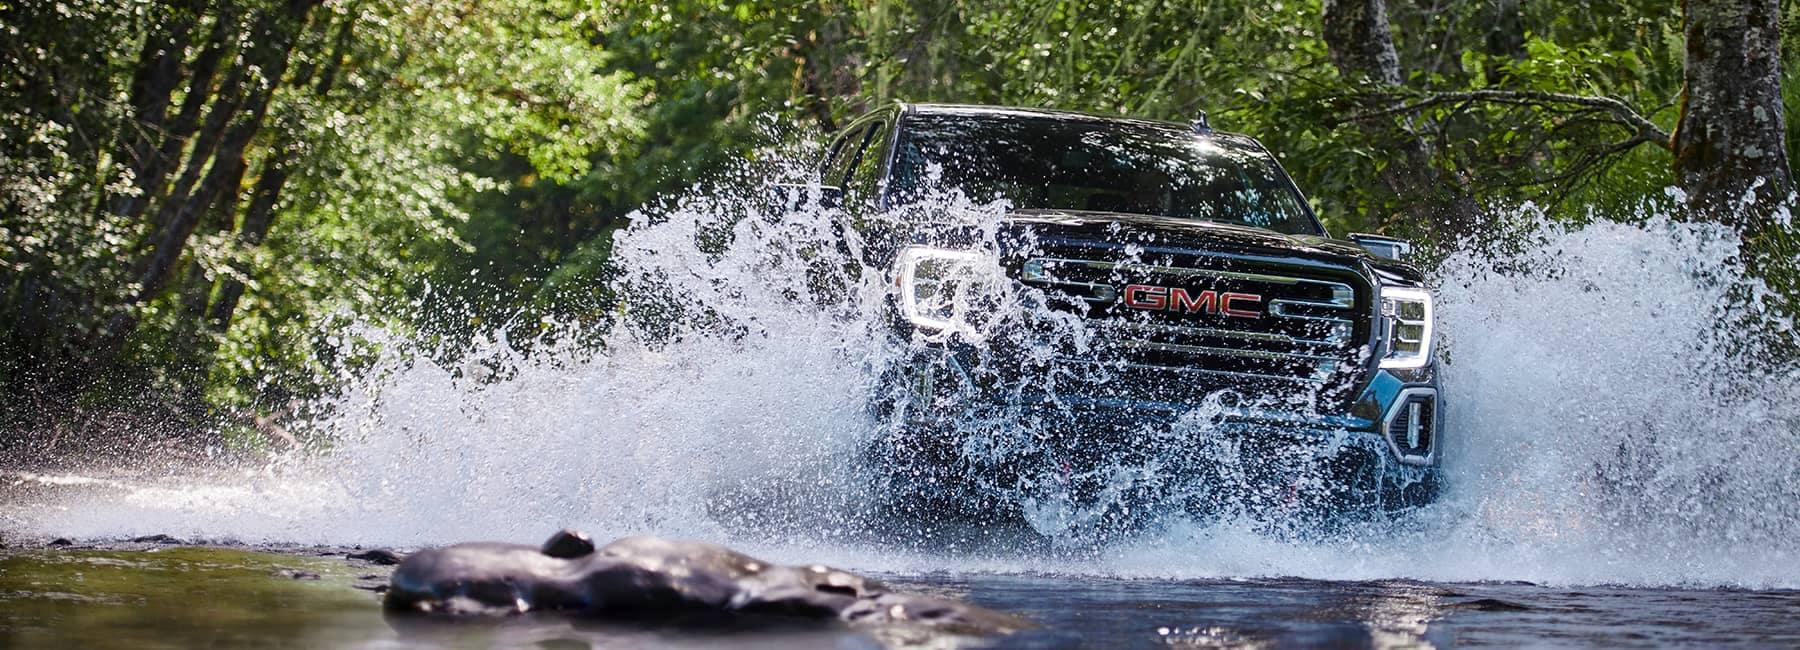 2020 GMC Sierra 1500 Crossing a River_mobile